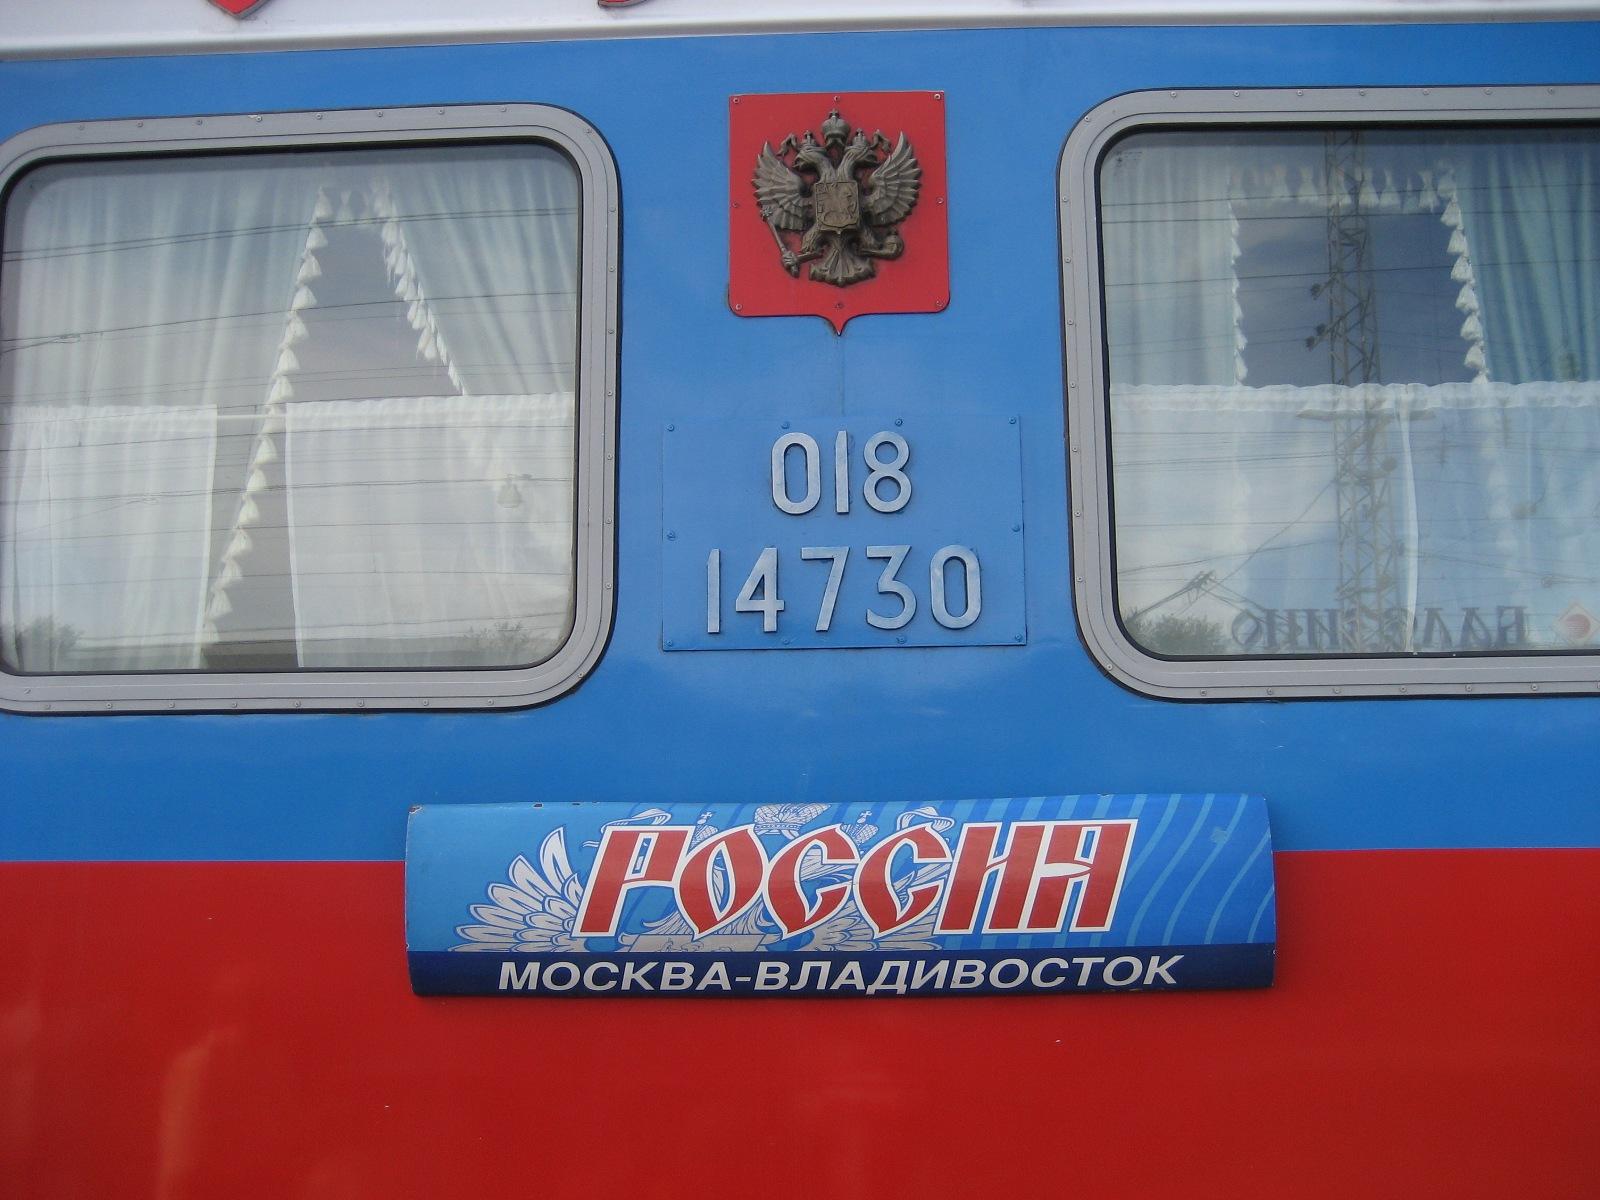 Epic train journeys of the world- Trans-Siberian Railway